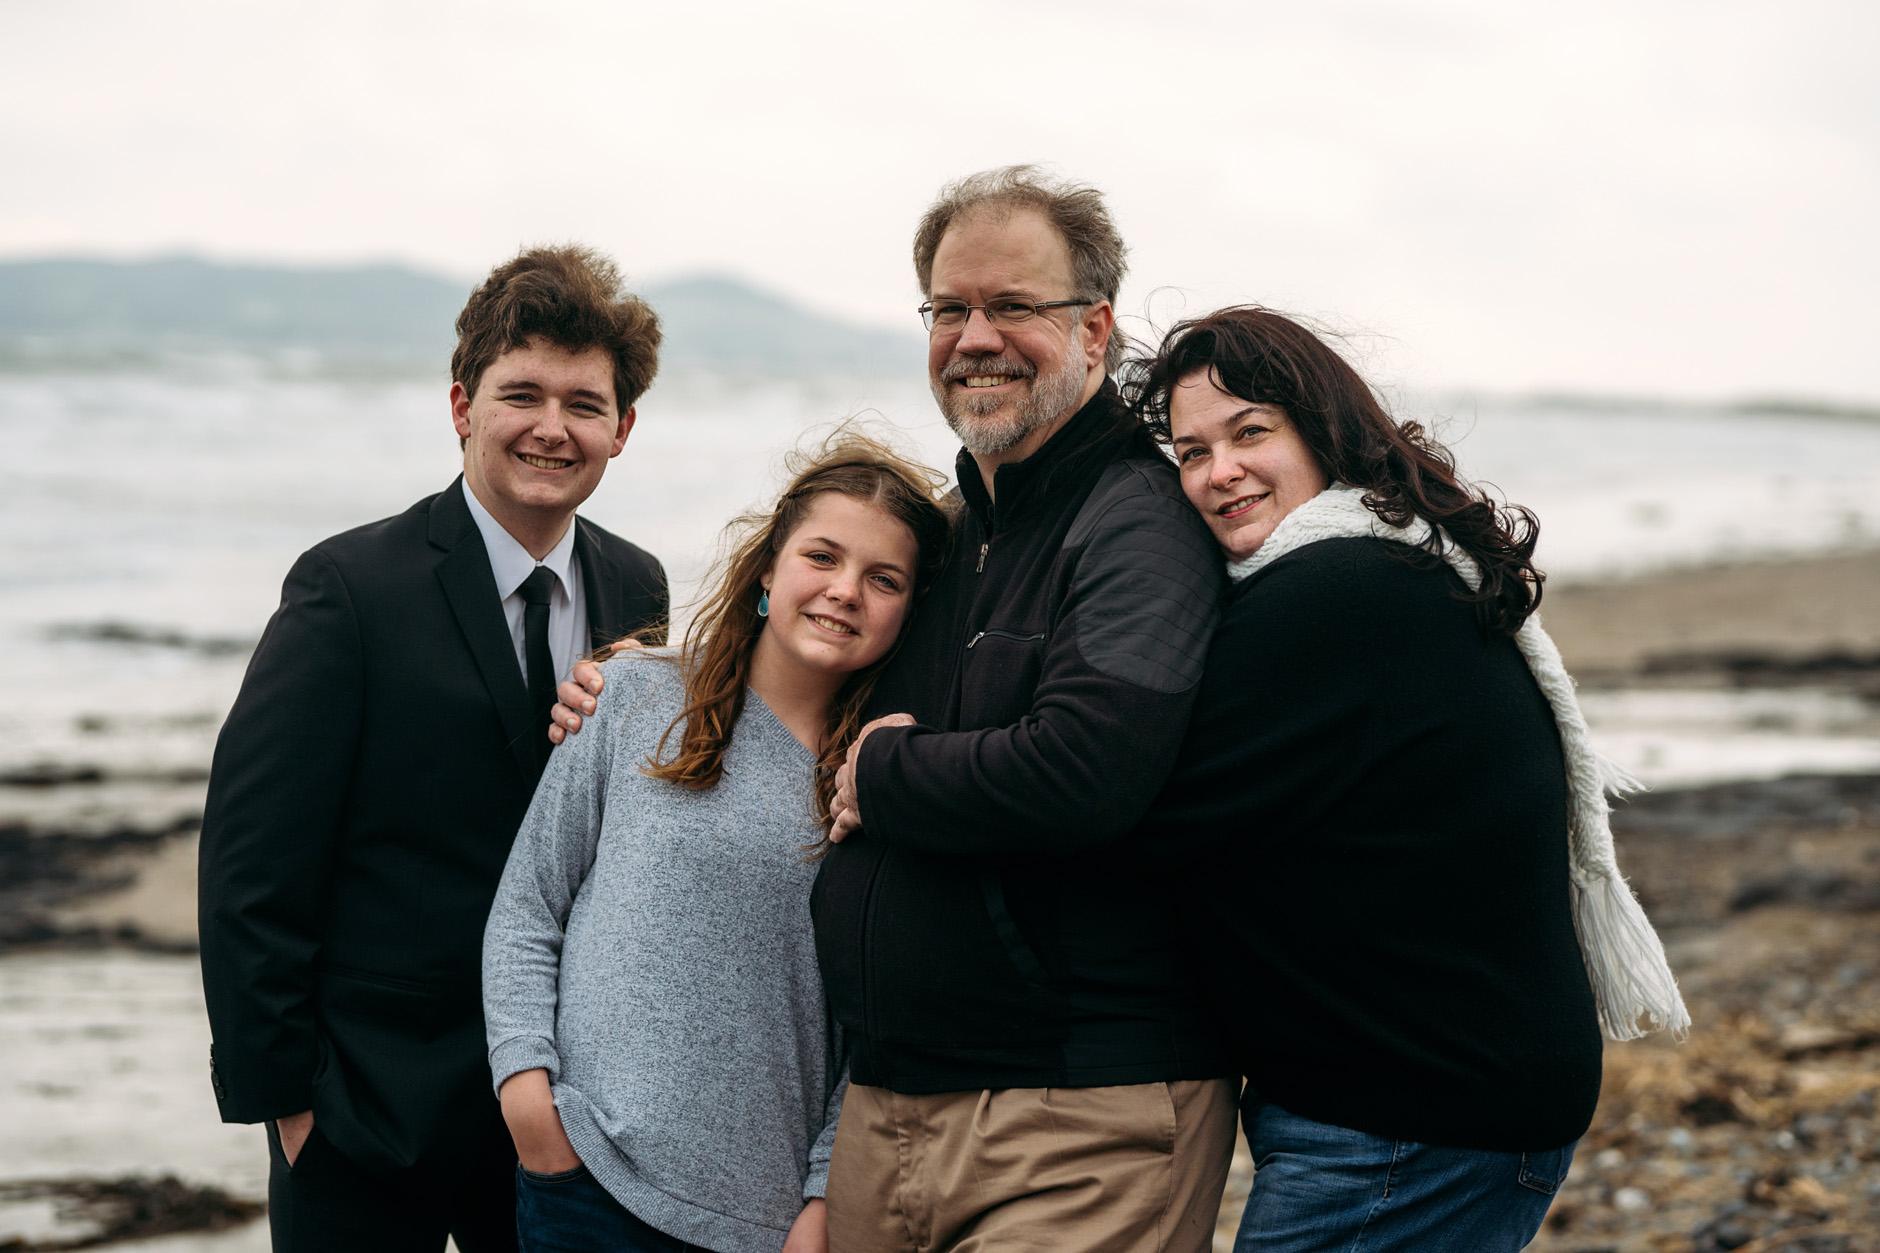 on-location-family-vacation-photographer-dublin-ireland-0060.jpg